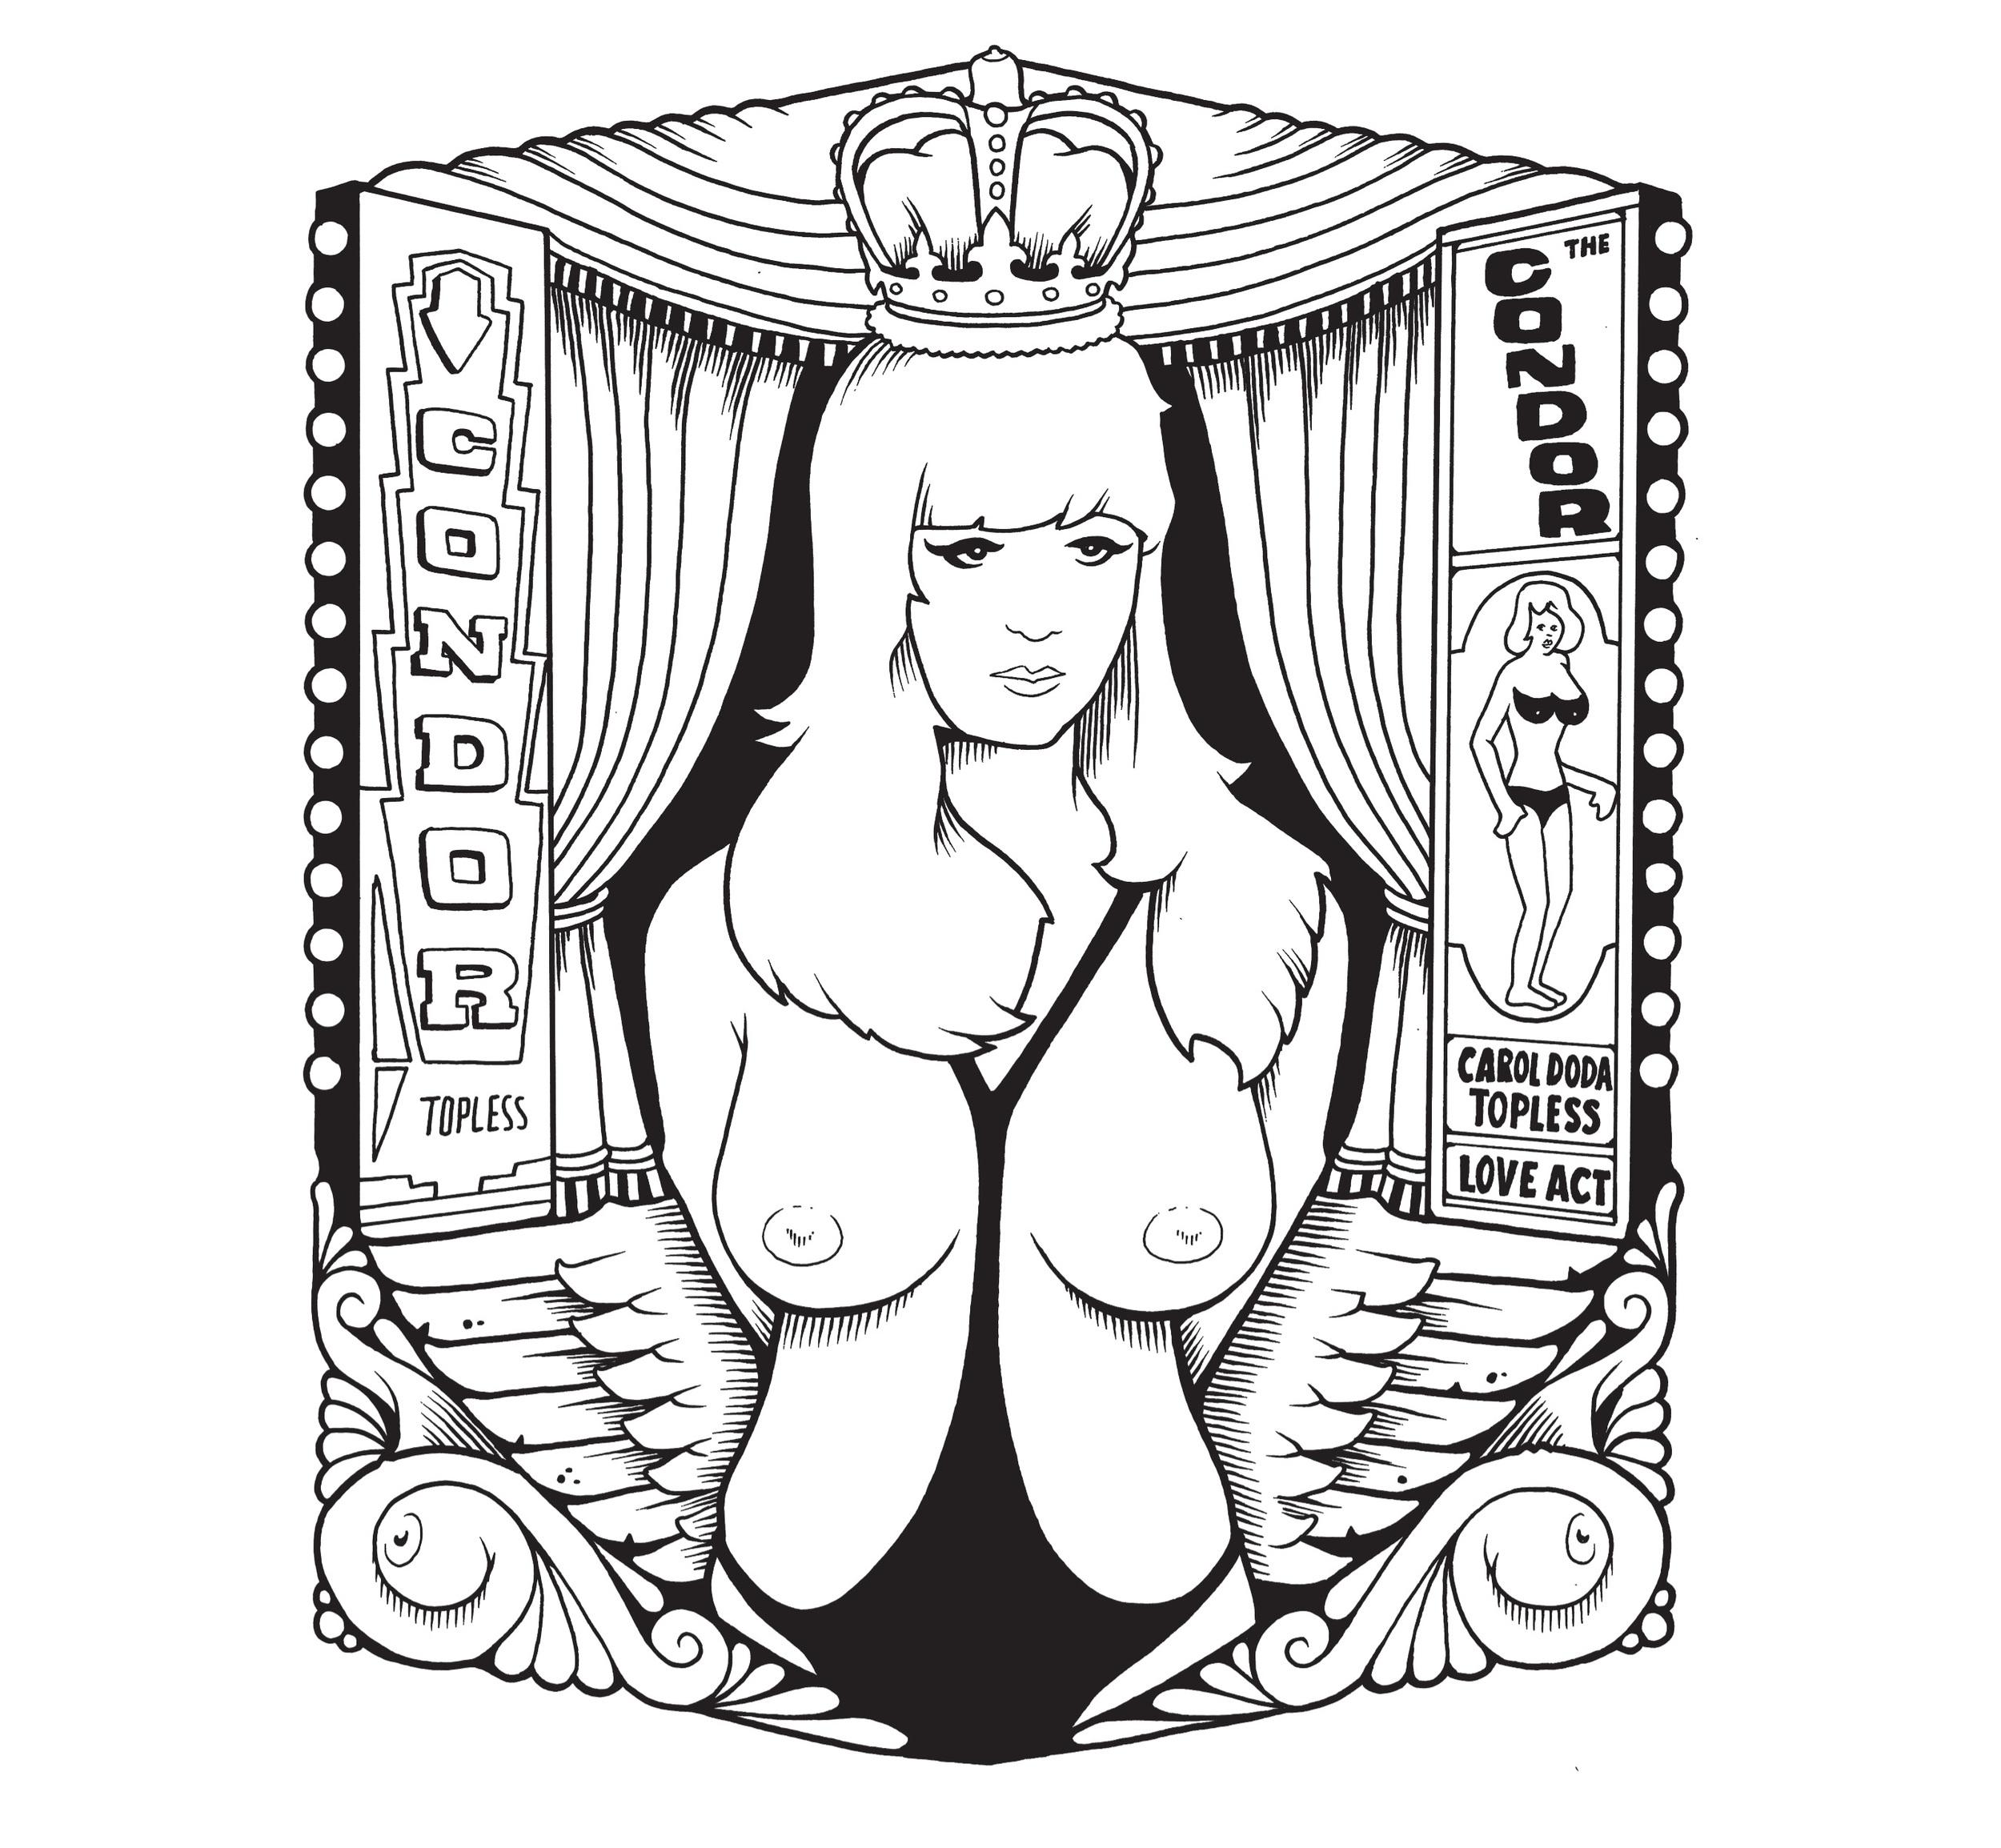 Topless Revolution